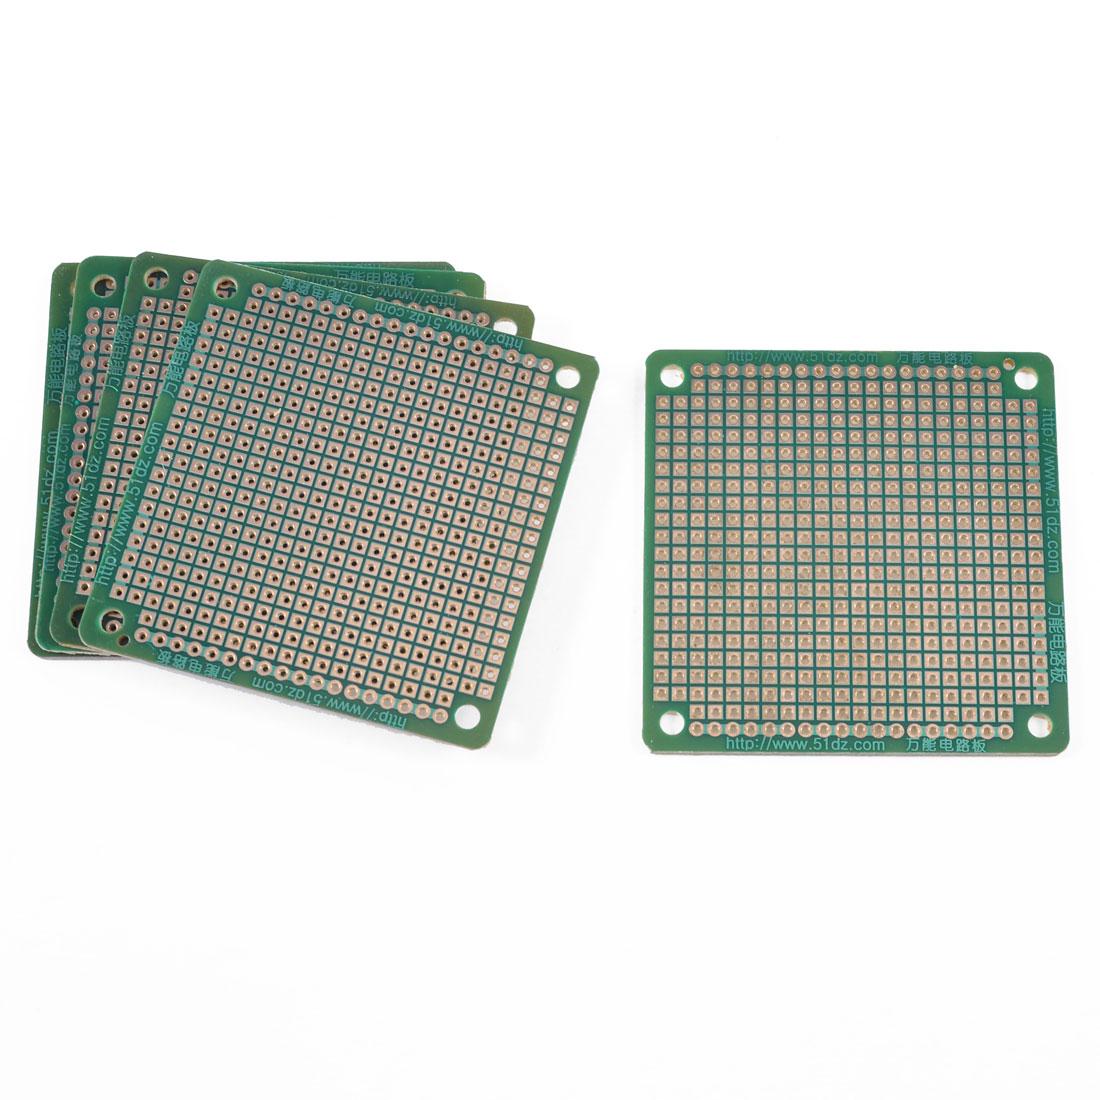 5 Pcs 6cm x 6cm Solderable Prototype Universal PCB Circuit Board